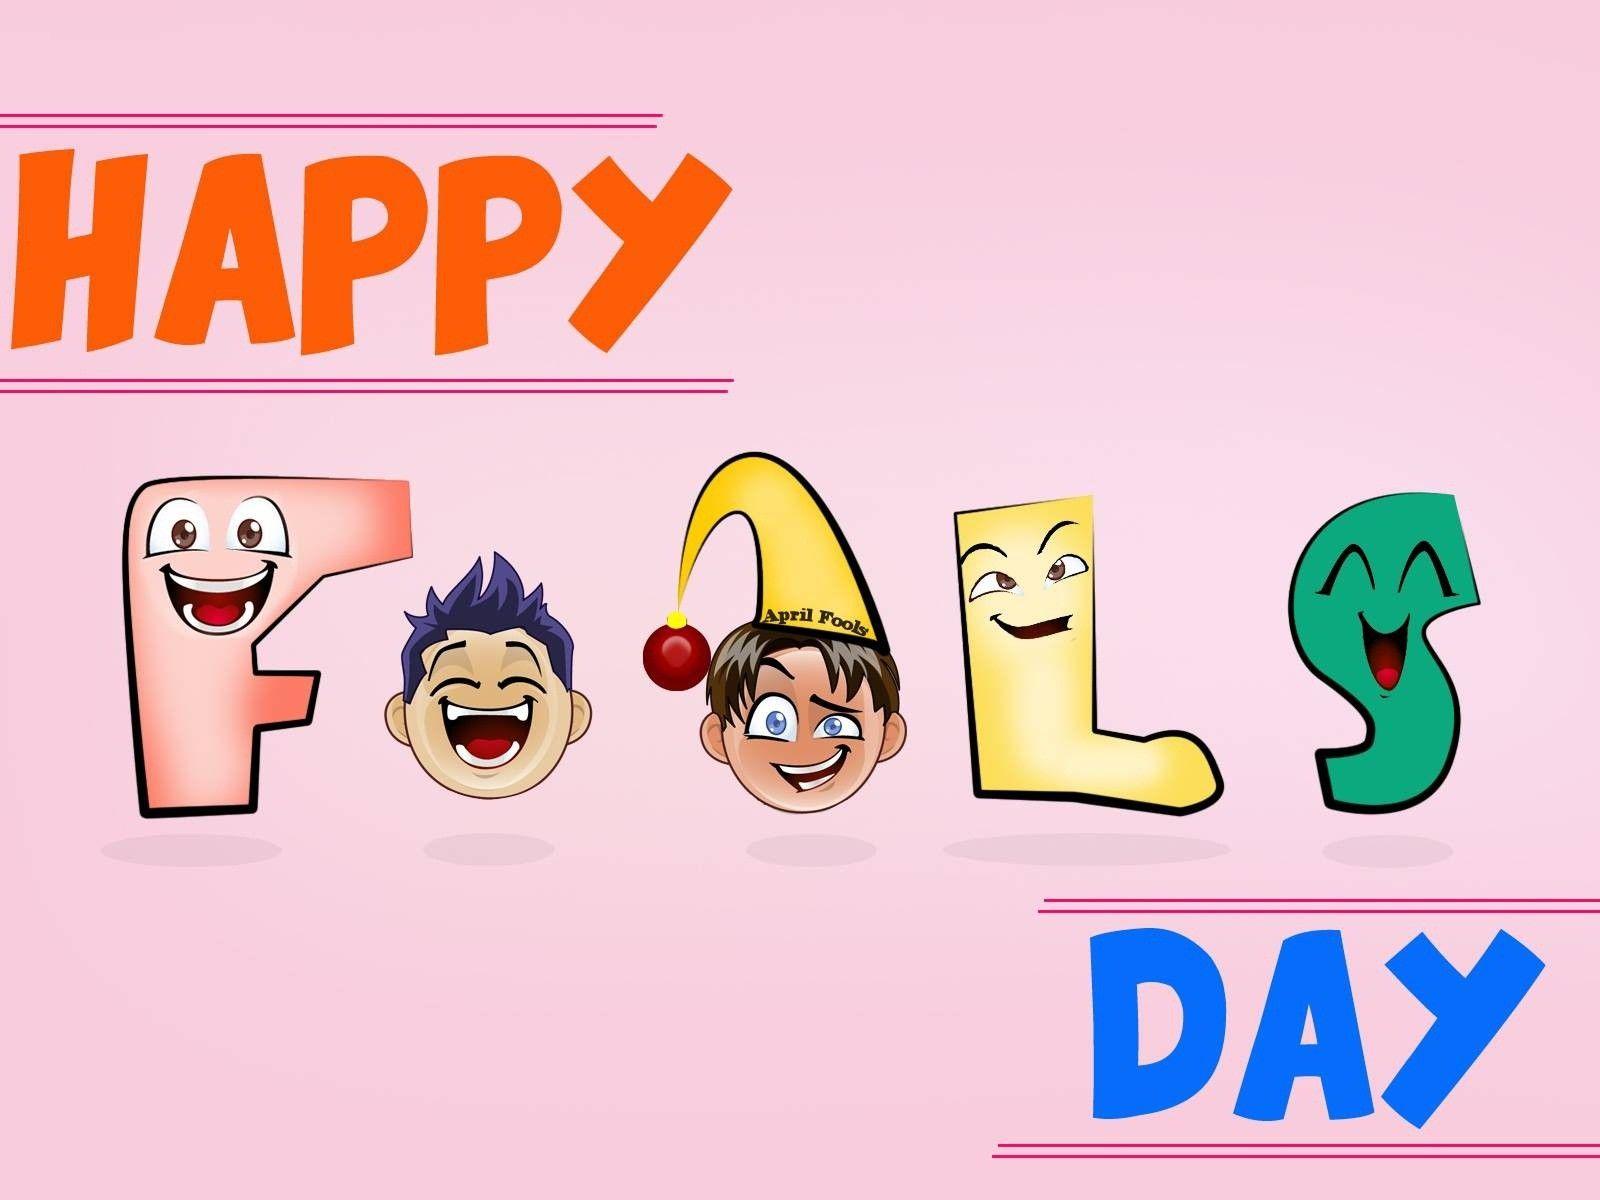 April Fools Day Wallpapers Free Download April Fool Images Best April Fools Best April Fools Pranks